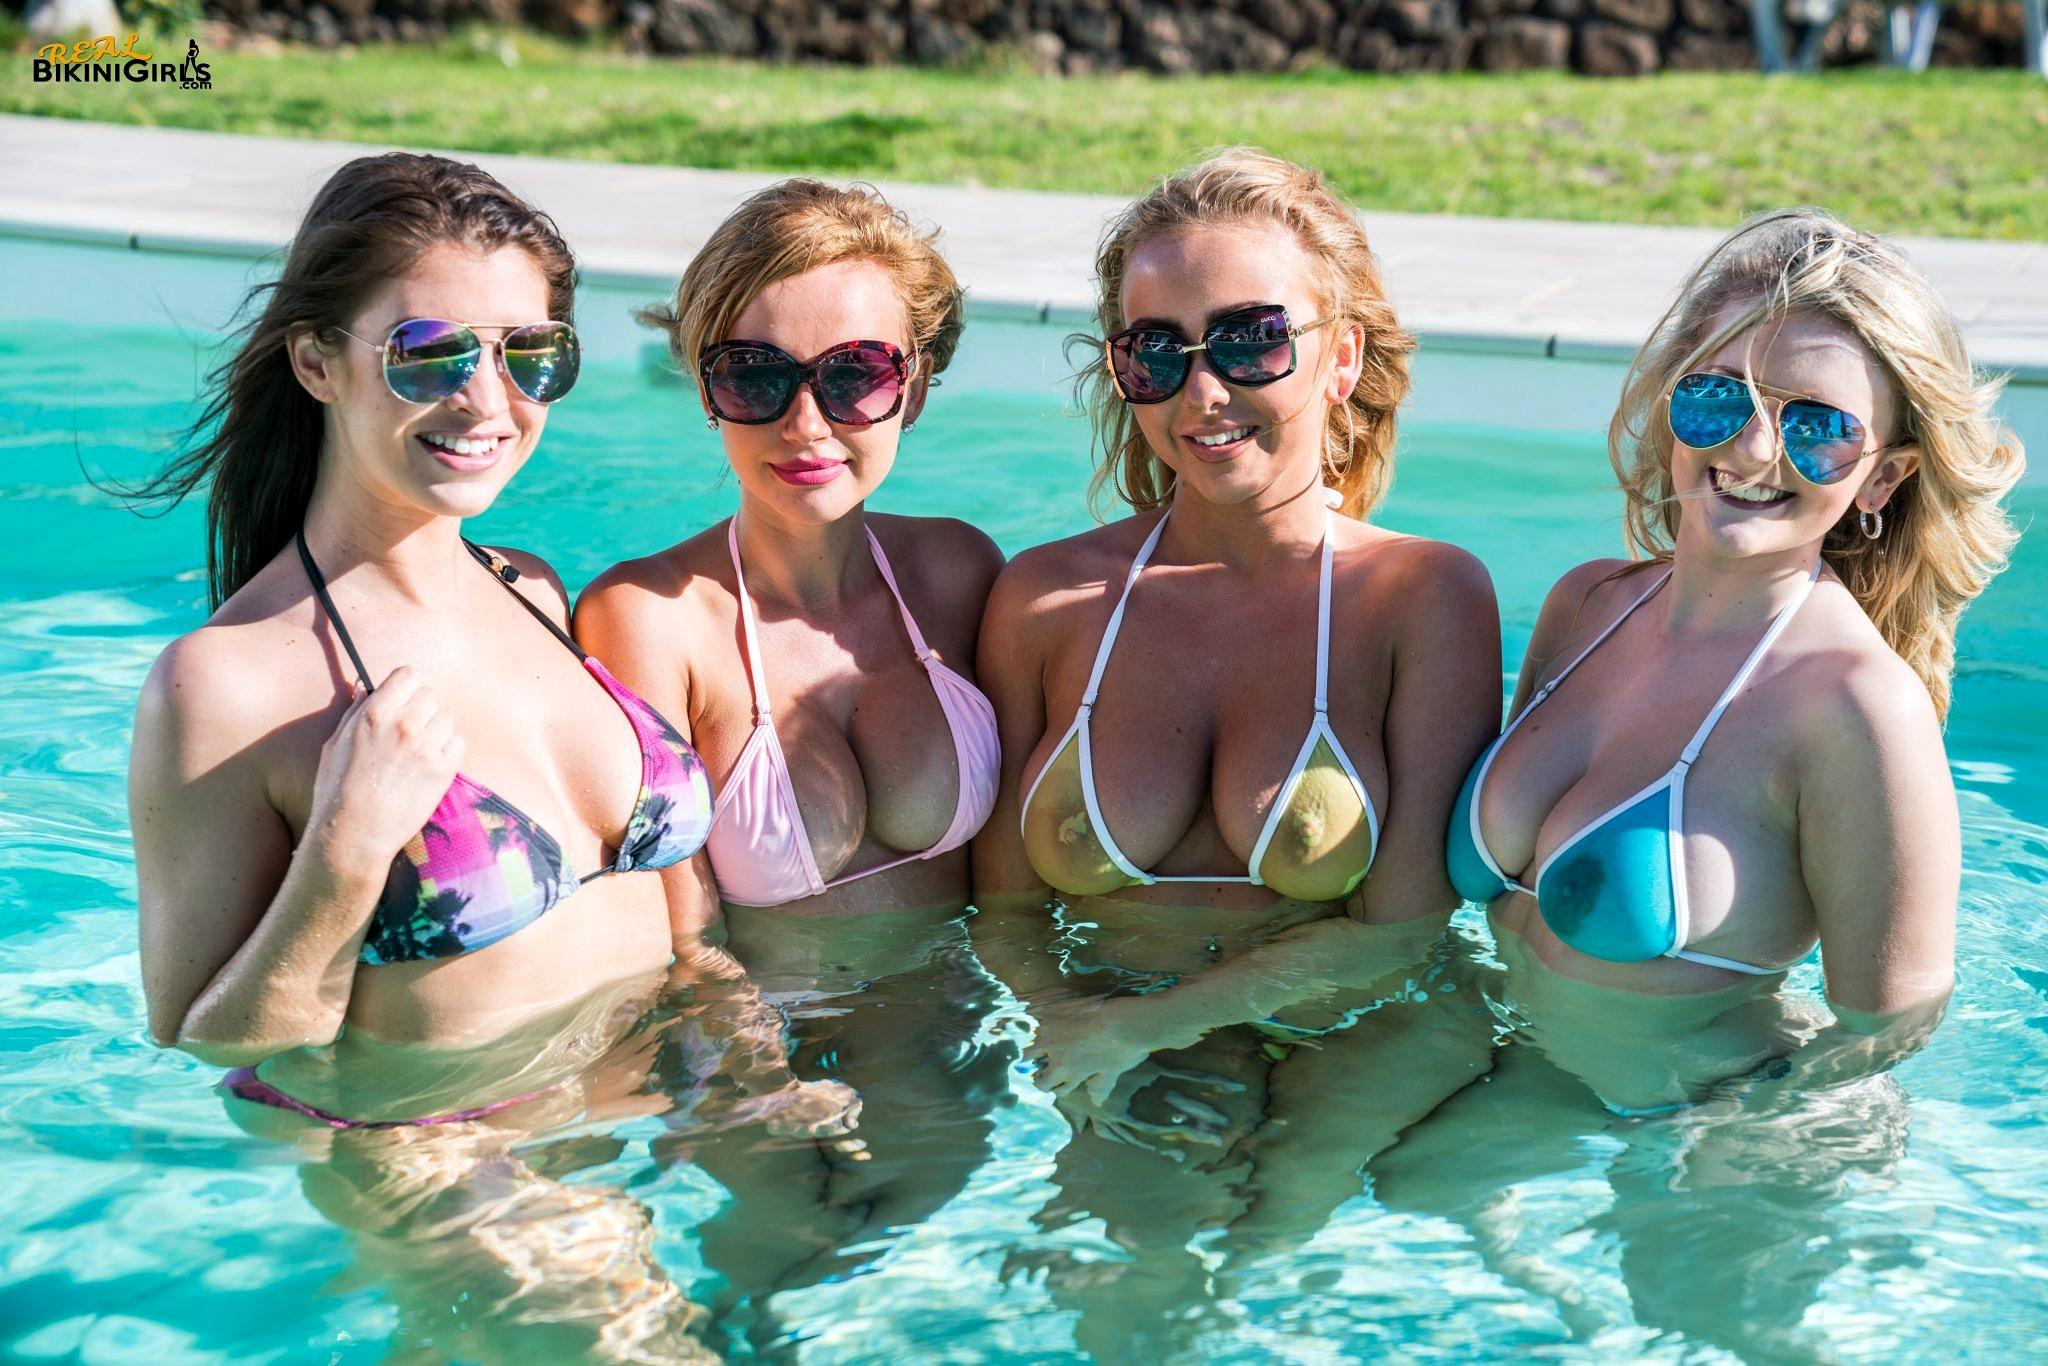 real bikini babes